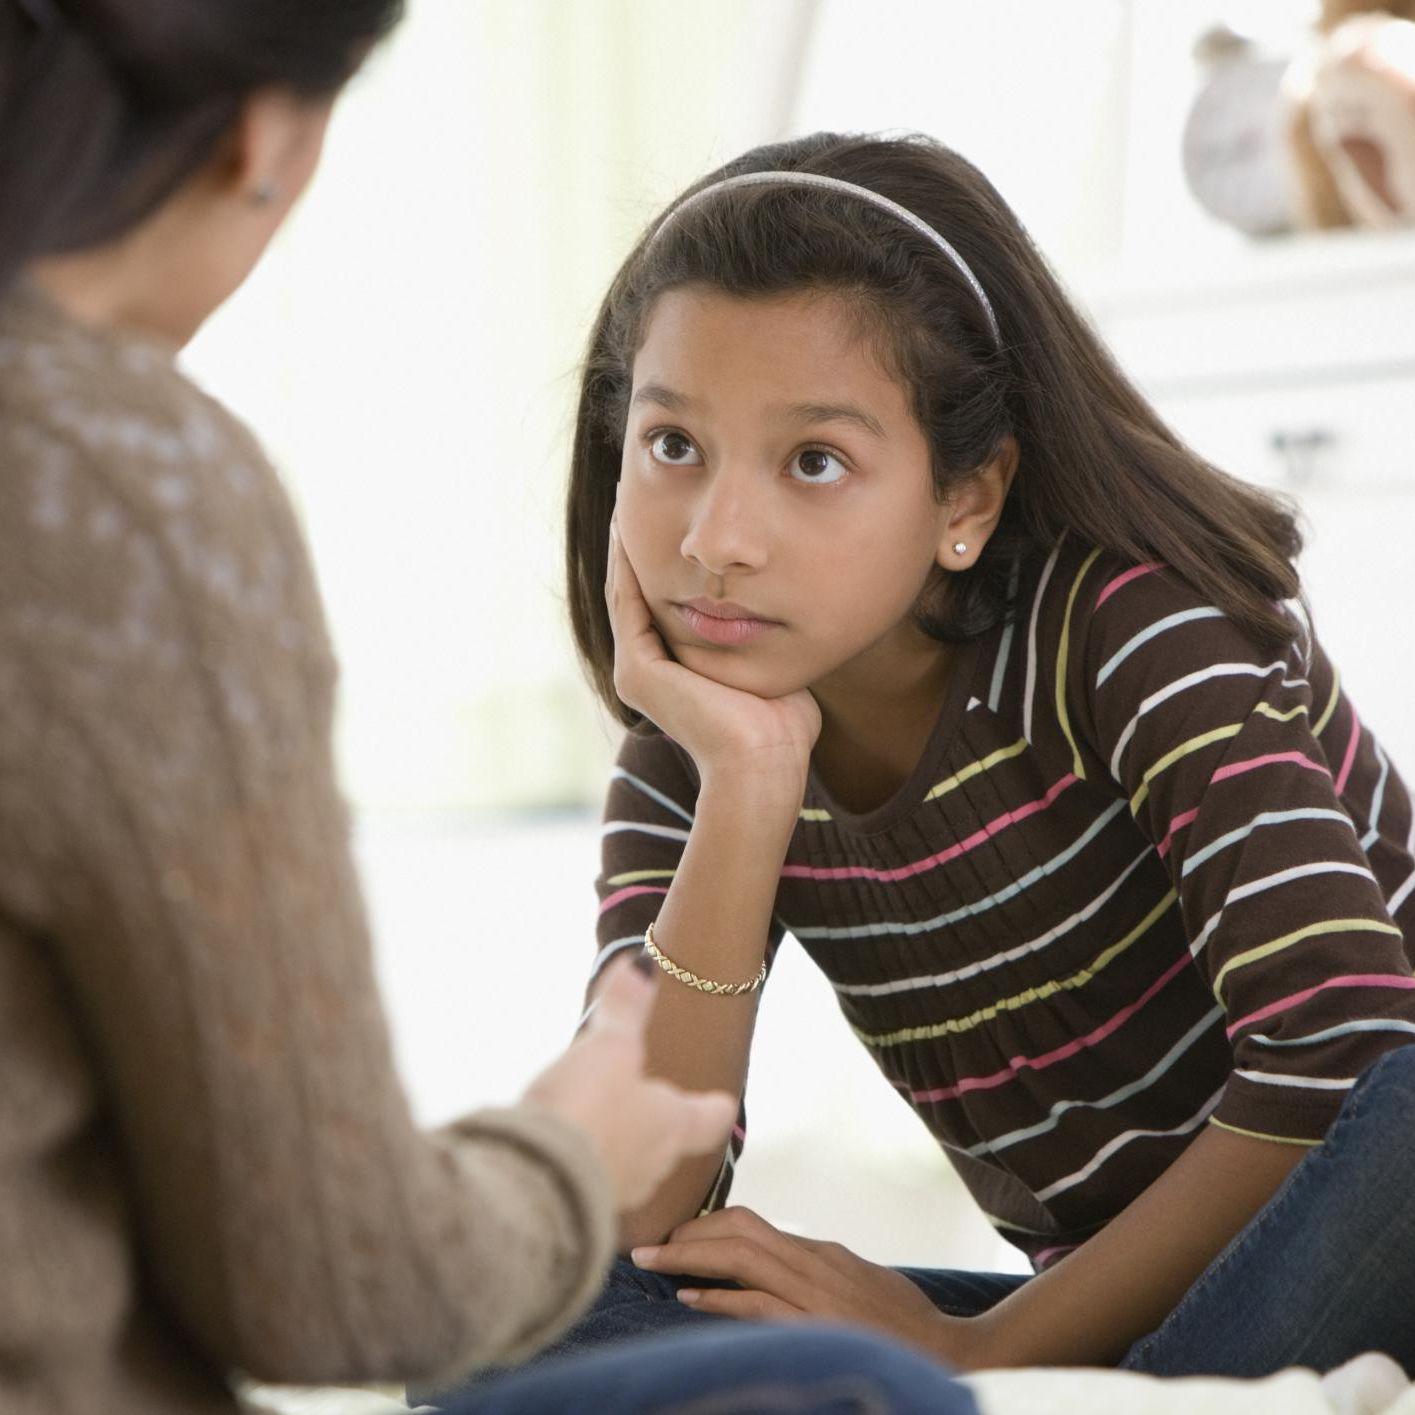 8 Ways to Avoid Raising a Bully